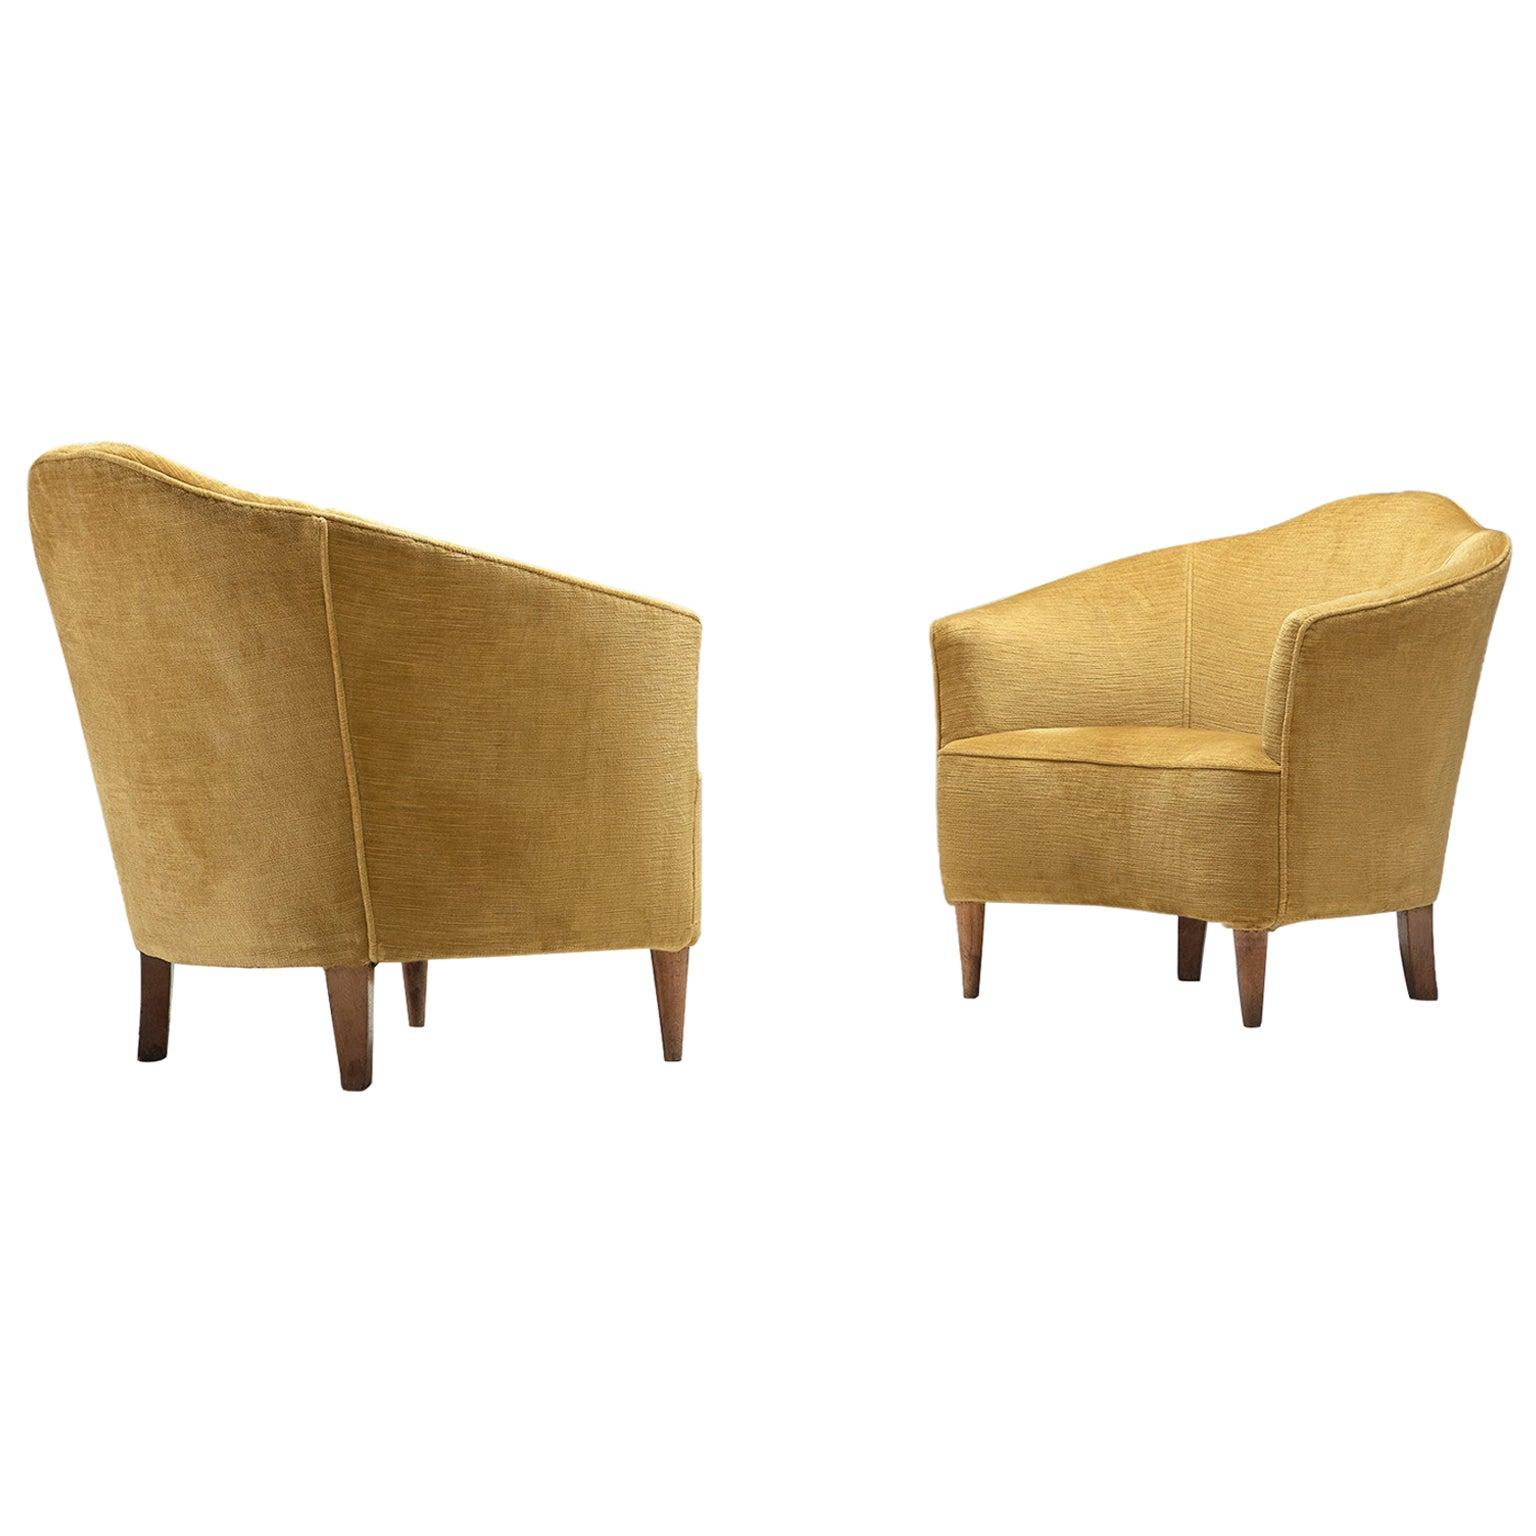 Pair of Italian Easy Chairs in Yellow Velvet